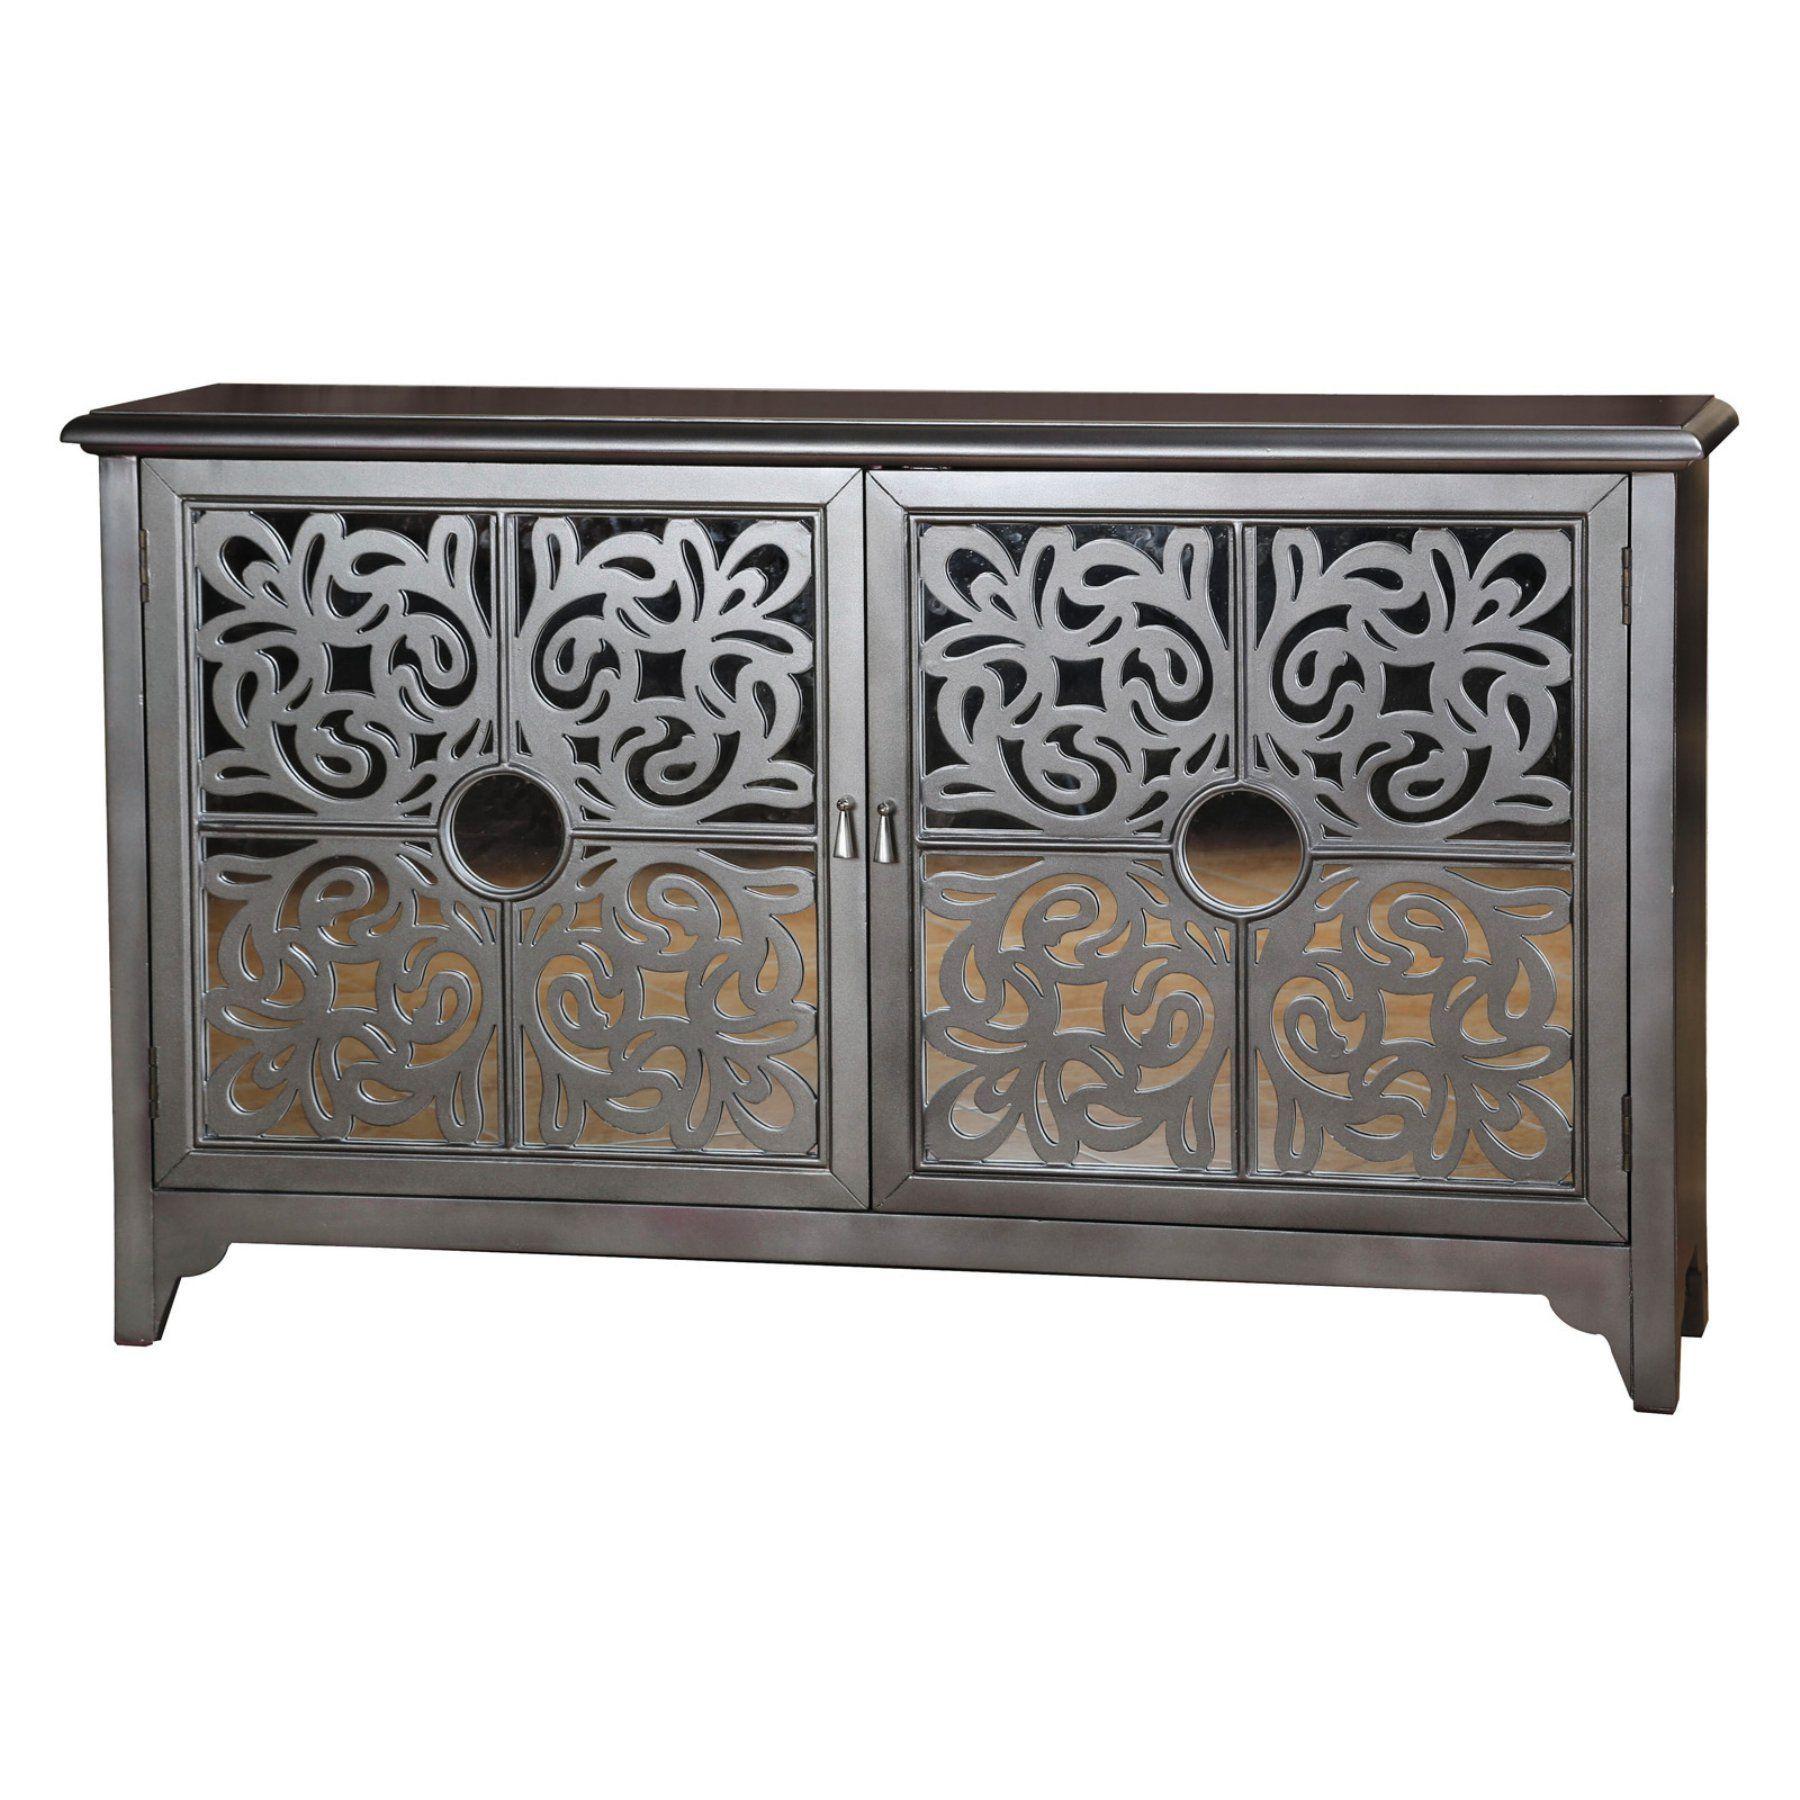 Pulaski Ornamental Fretwork Storage Credenza  675081